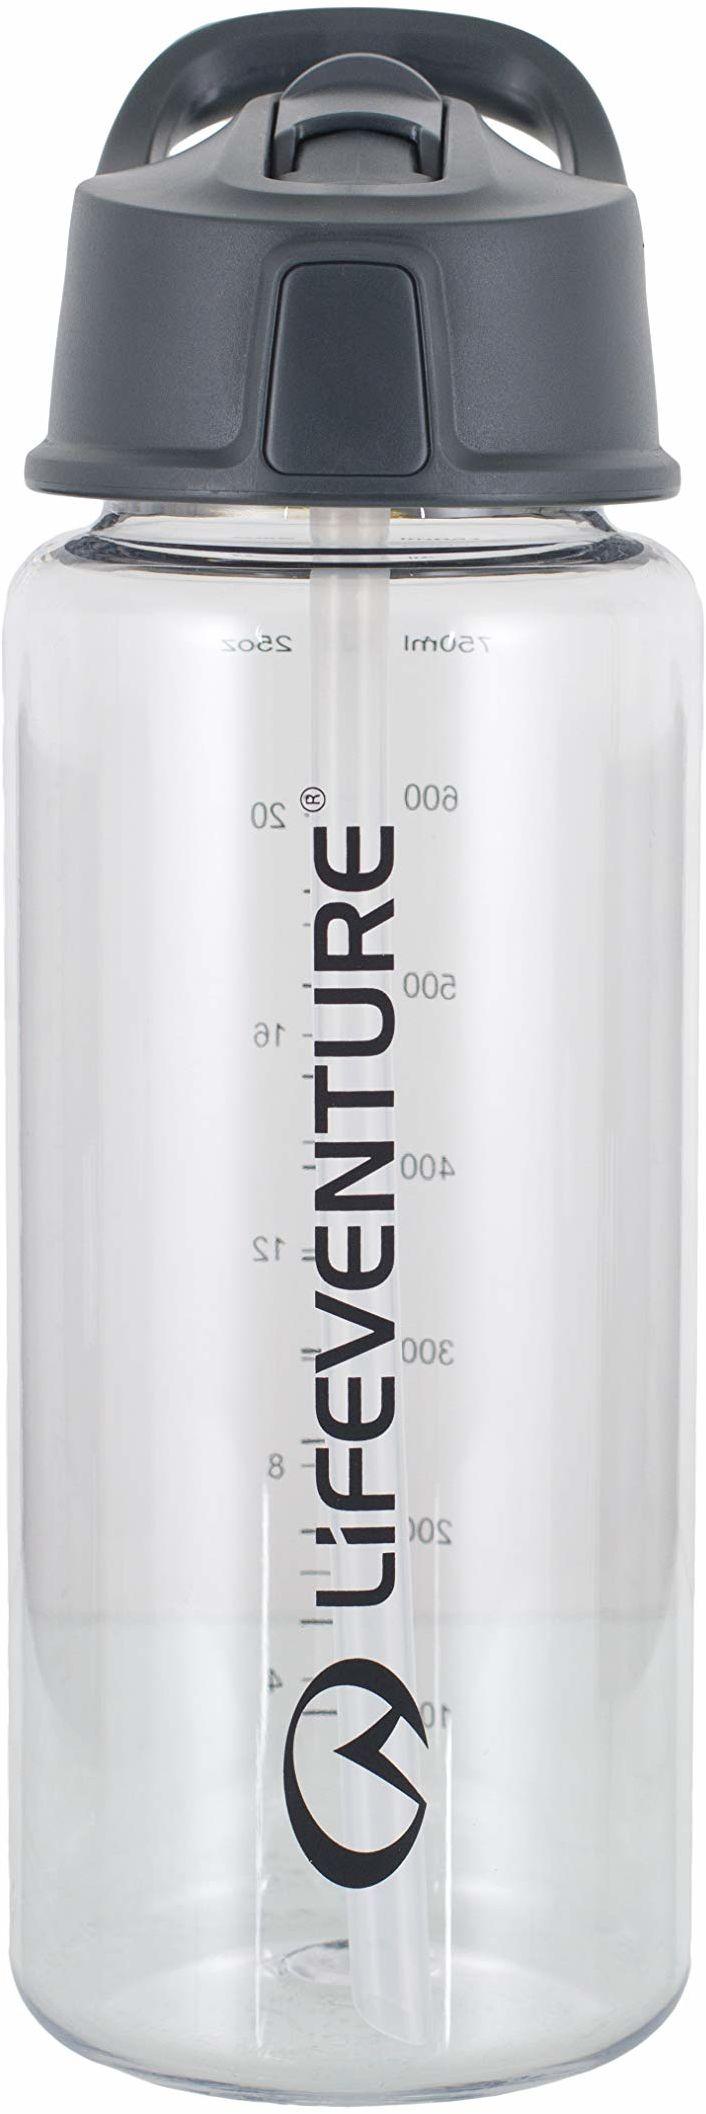 Lifeventure Unisex''s Flip-Top butelka na wodę, przezroczysta, 750 ml